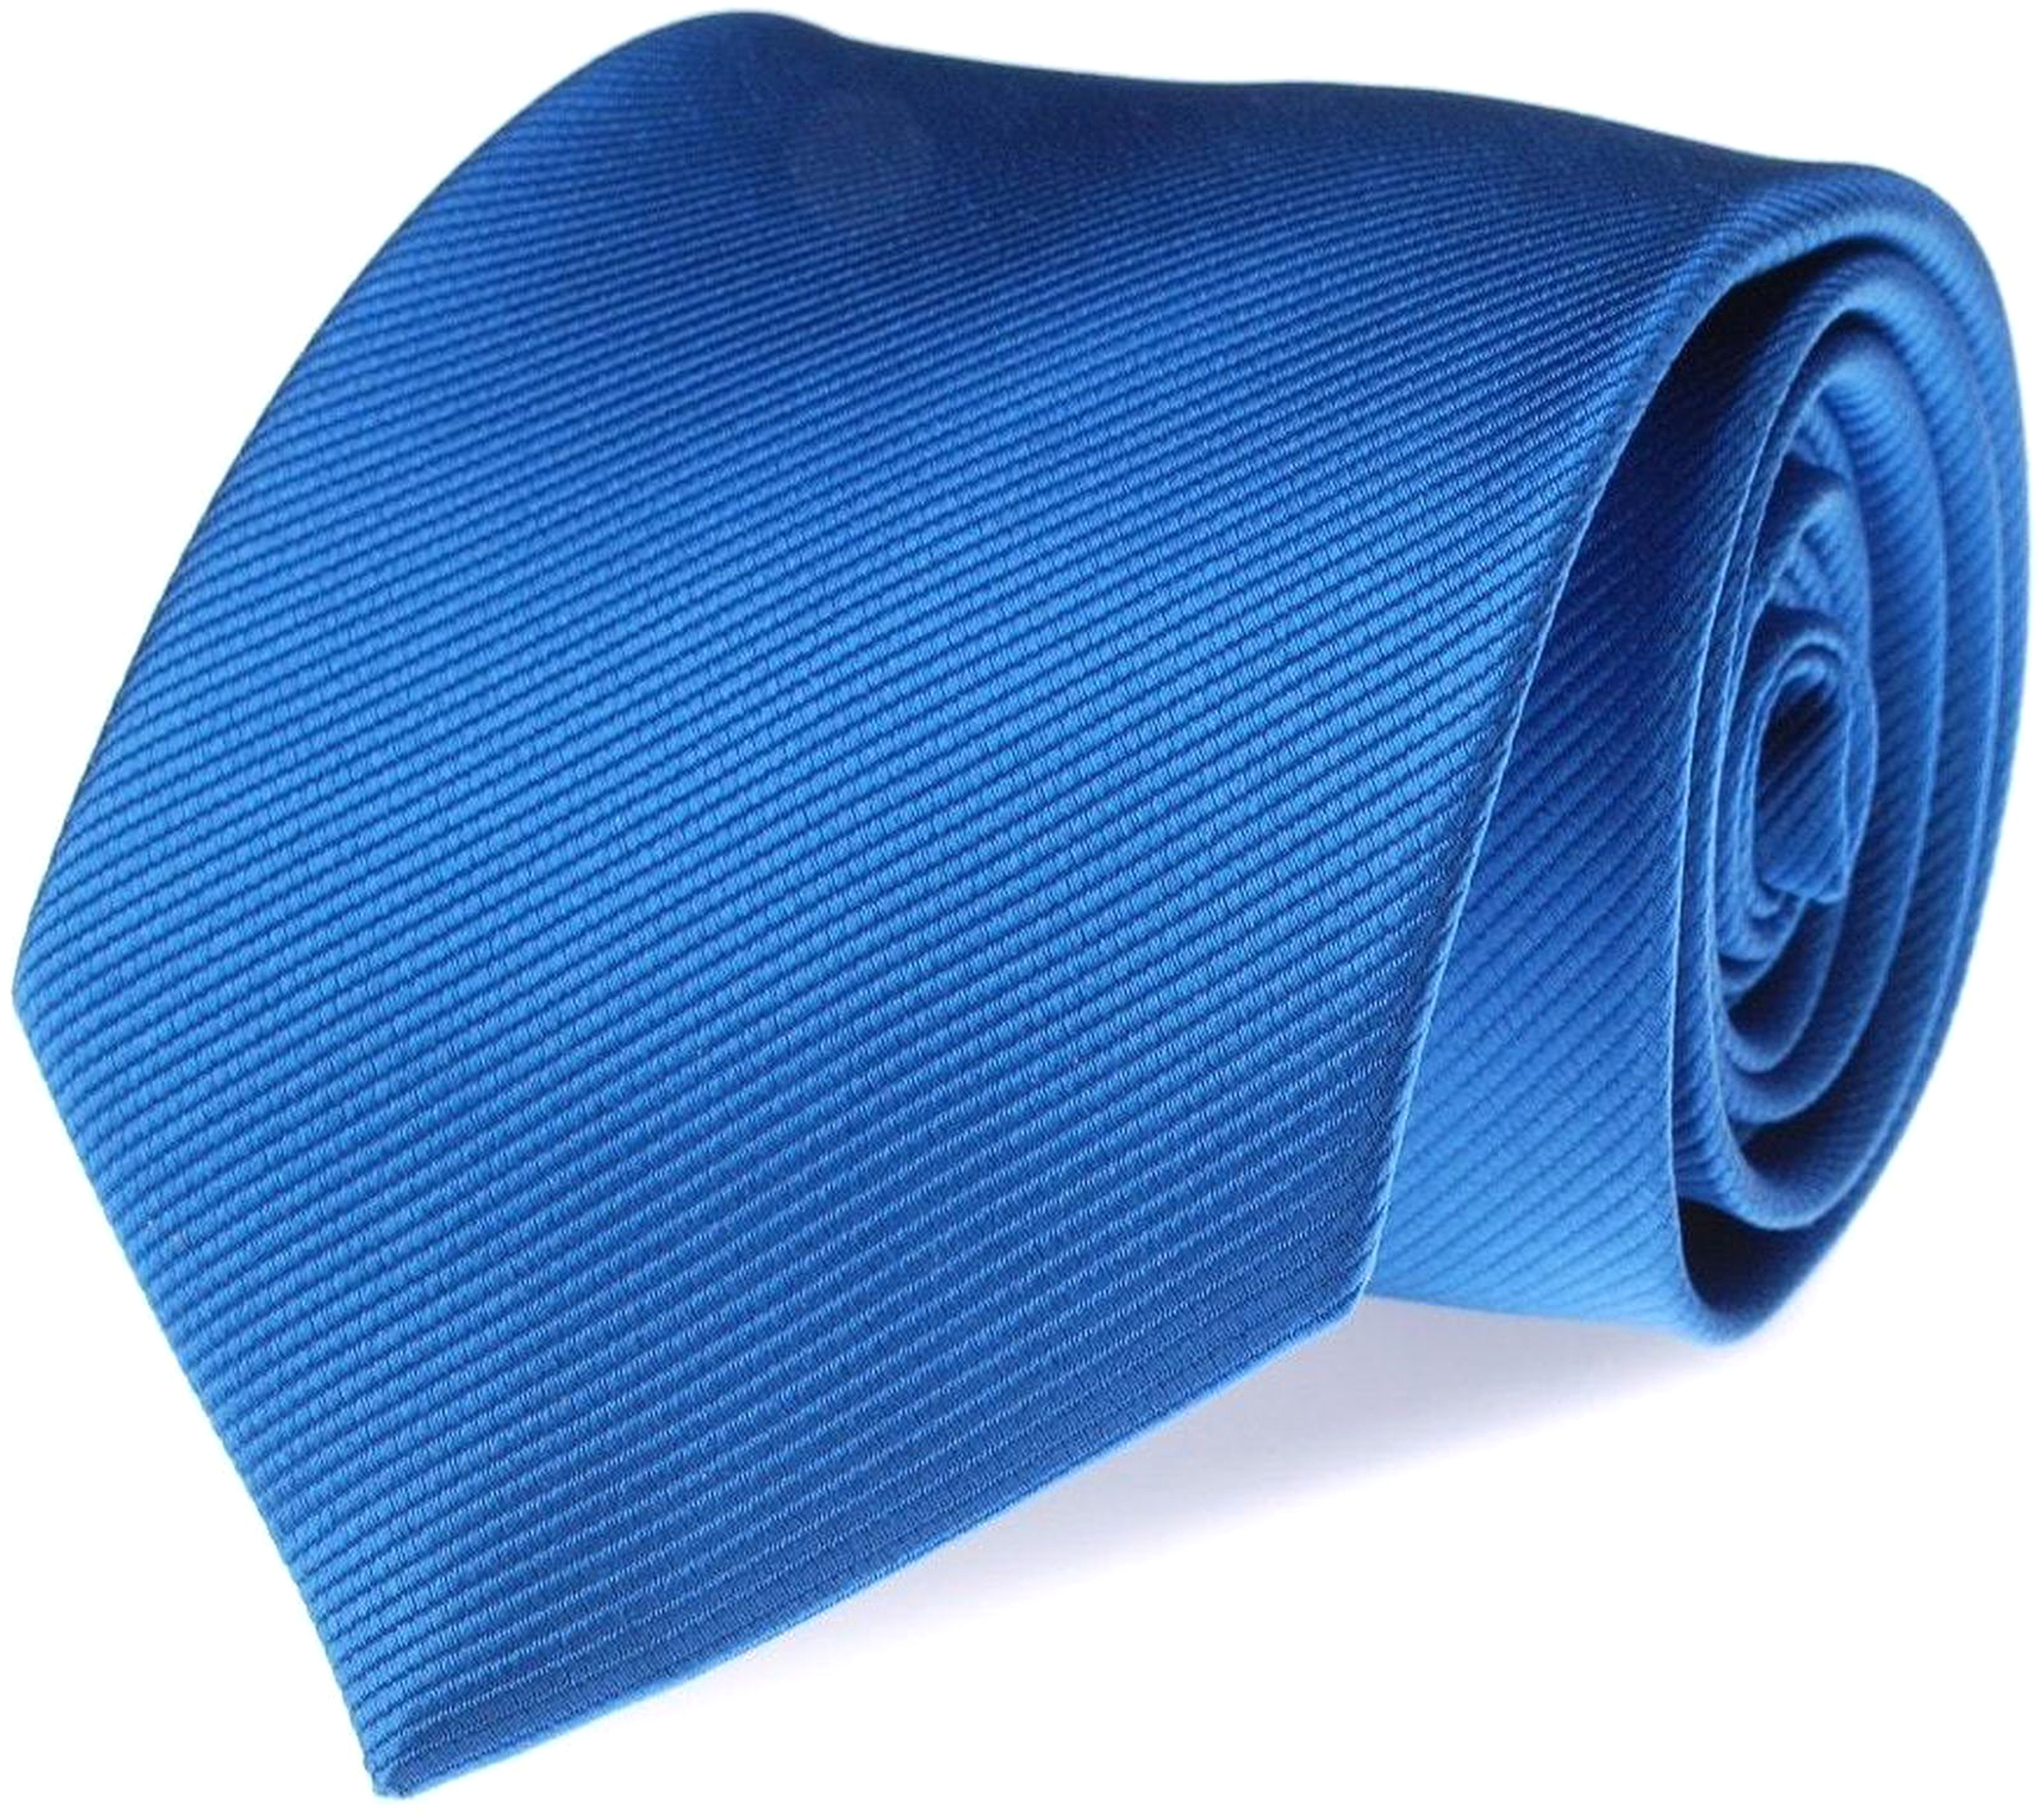 Krawatte Seide Königsblau Uni F05 foto 0